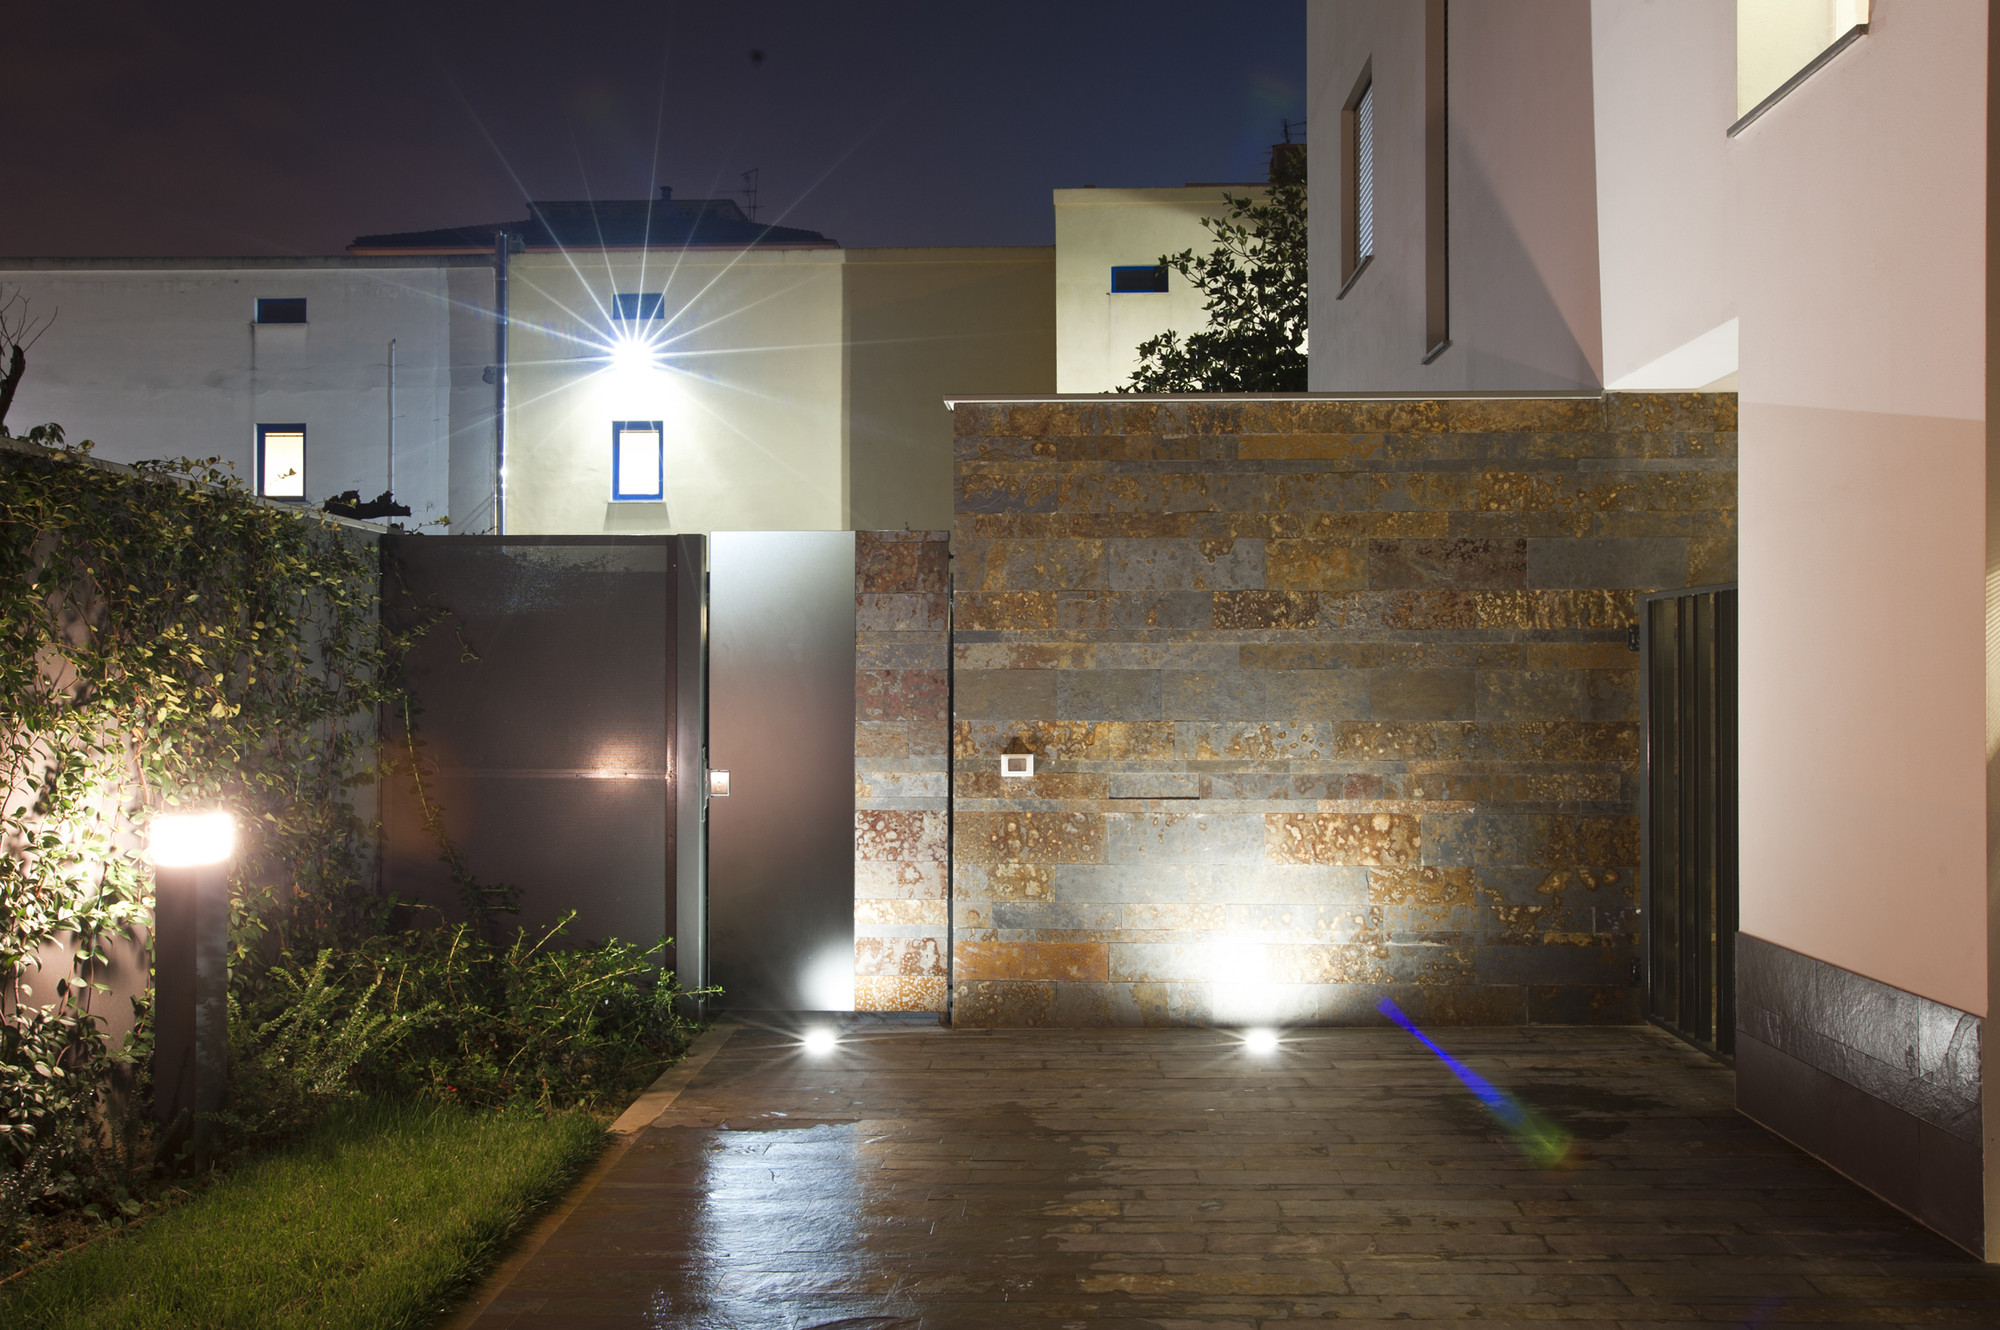 Gallery of residential building u201cbrancacciu201d alessandro luigini 10